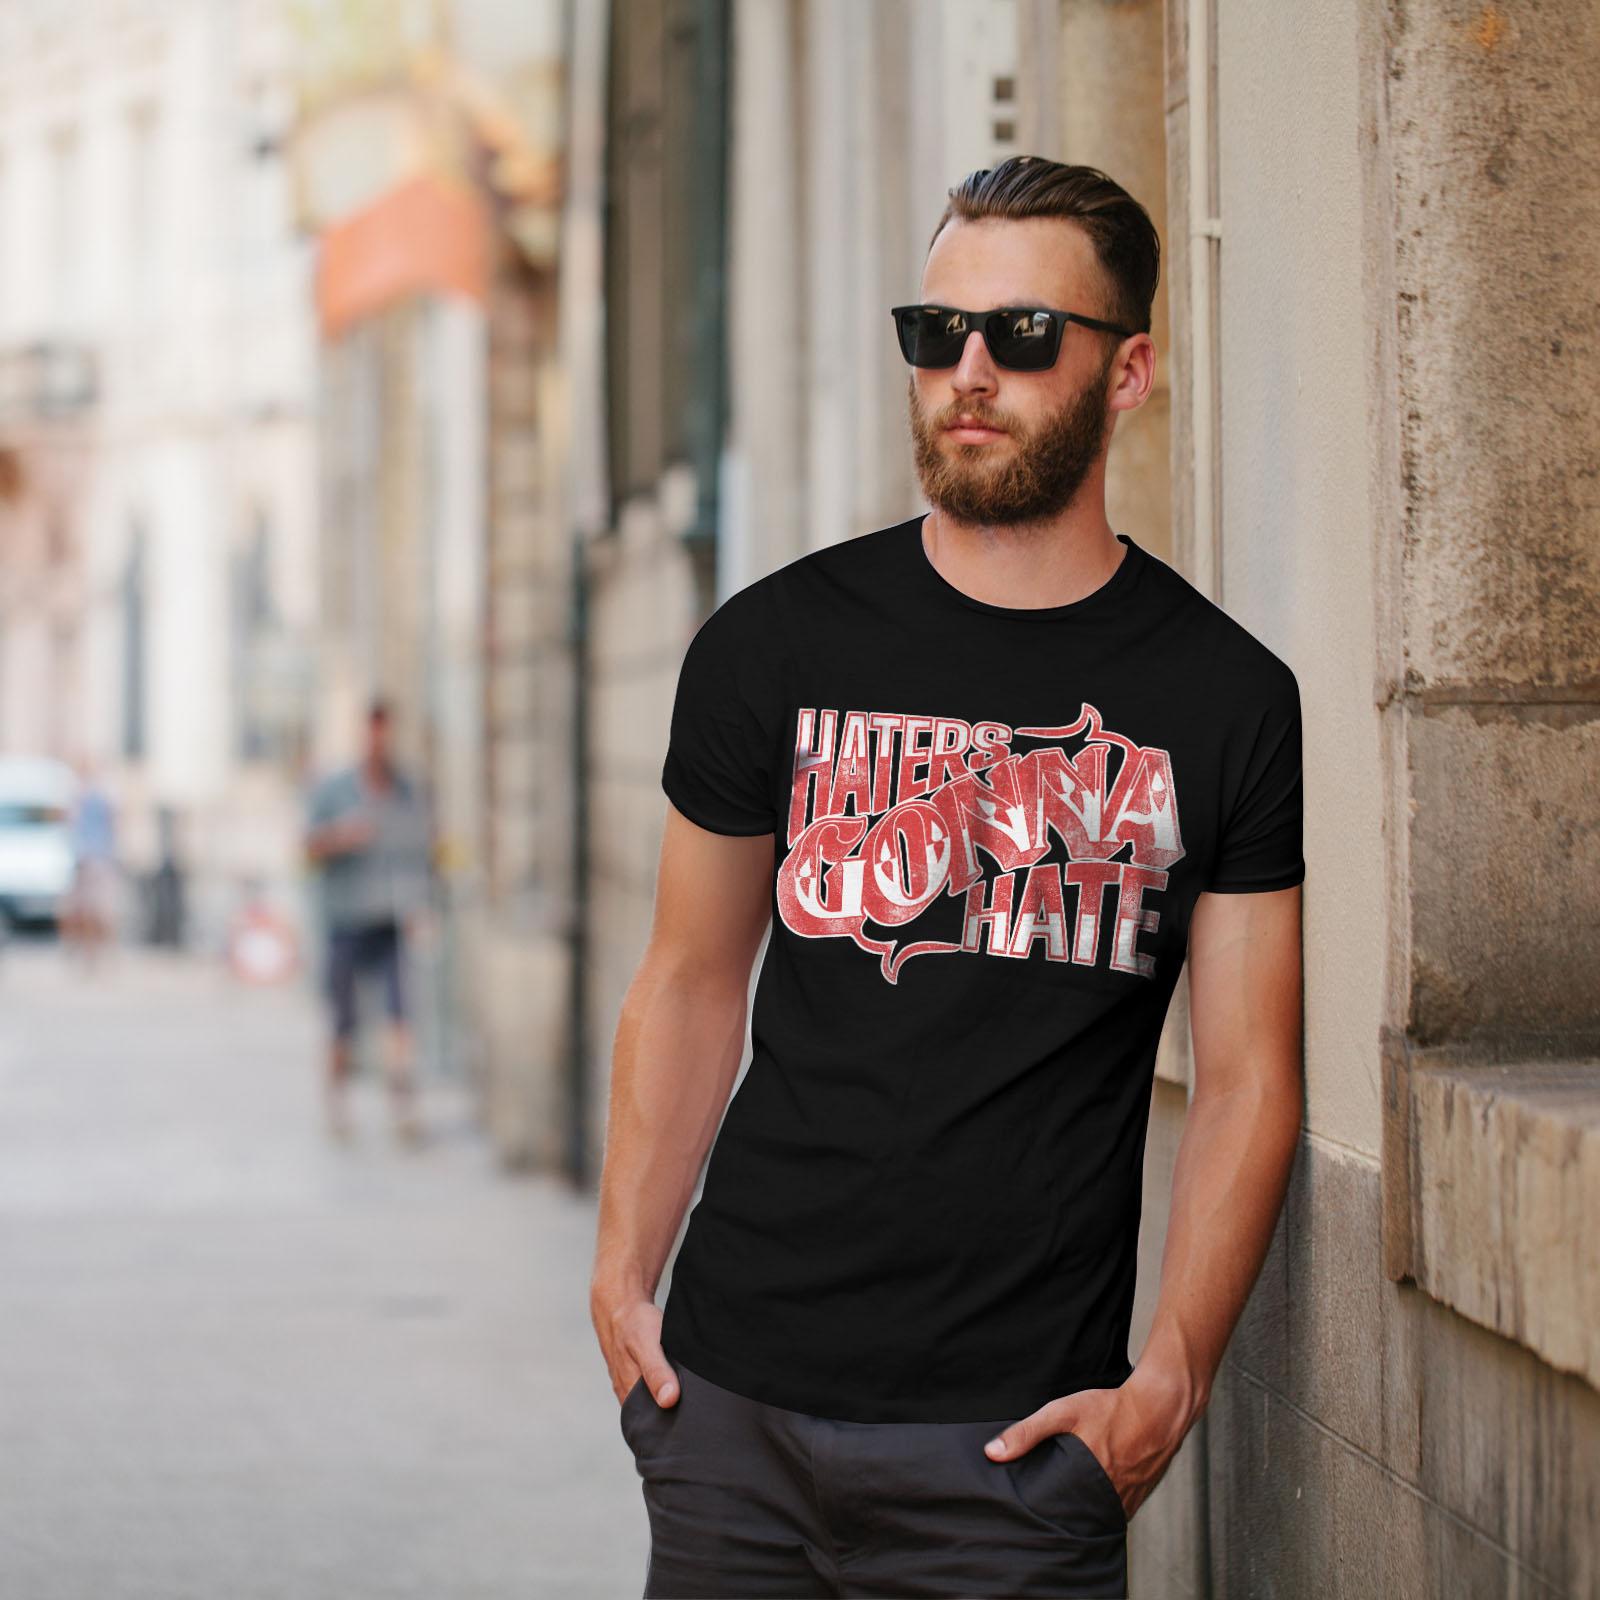 Wellcoda-Wasser-hassen-Zitat-Slogan-Herren-T-Shirt-True-Grafikdesign-Printed-Tee Indexbild 5